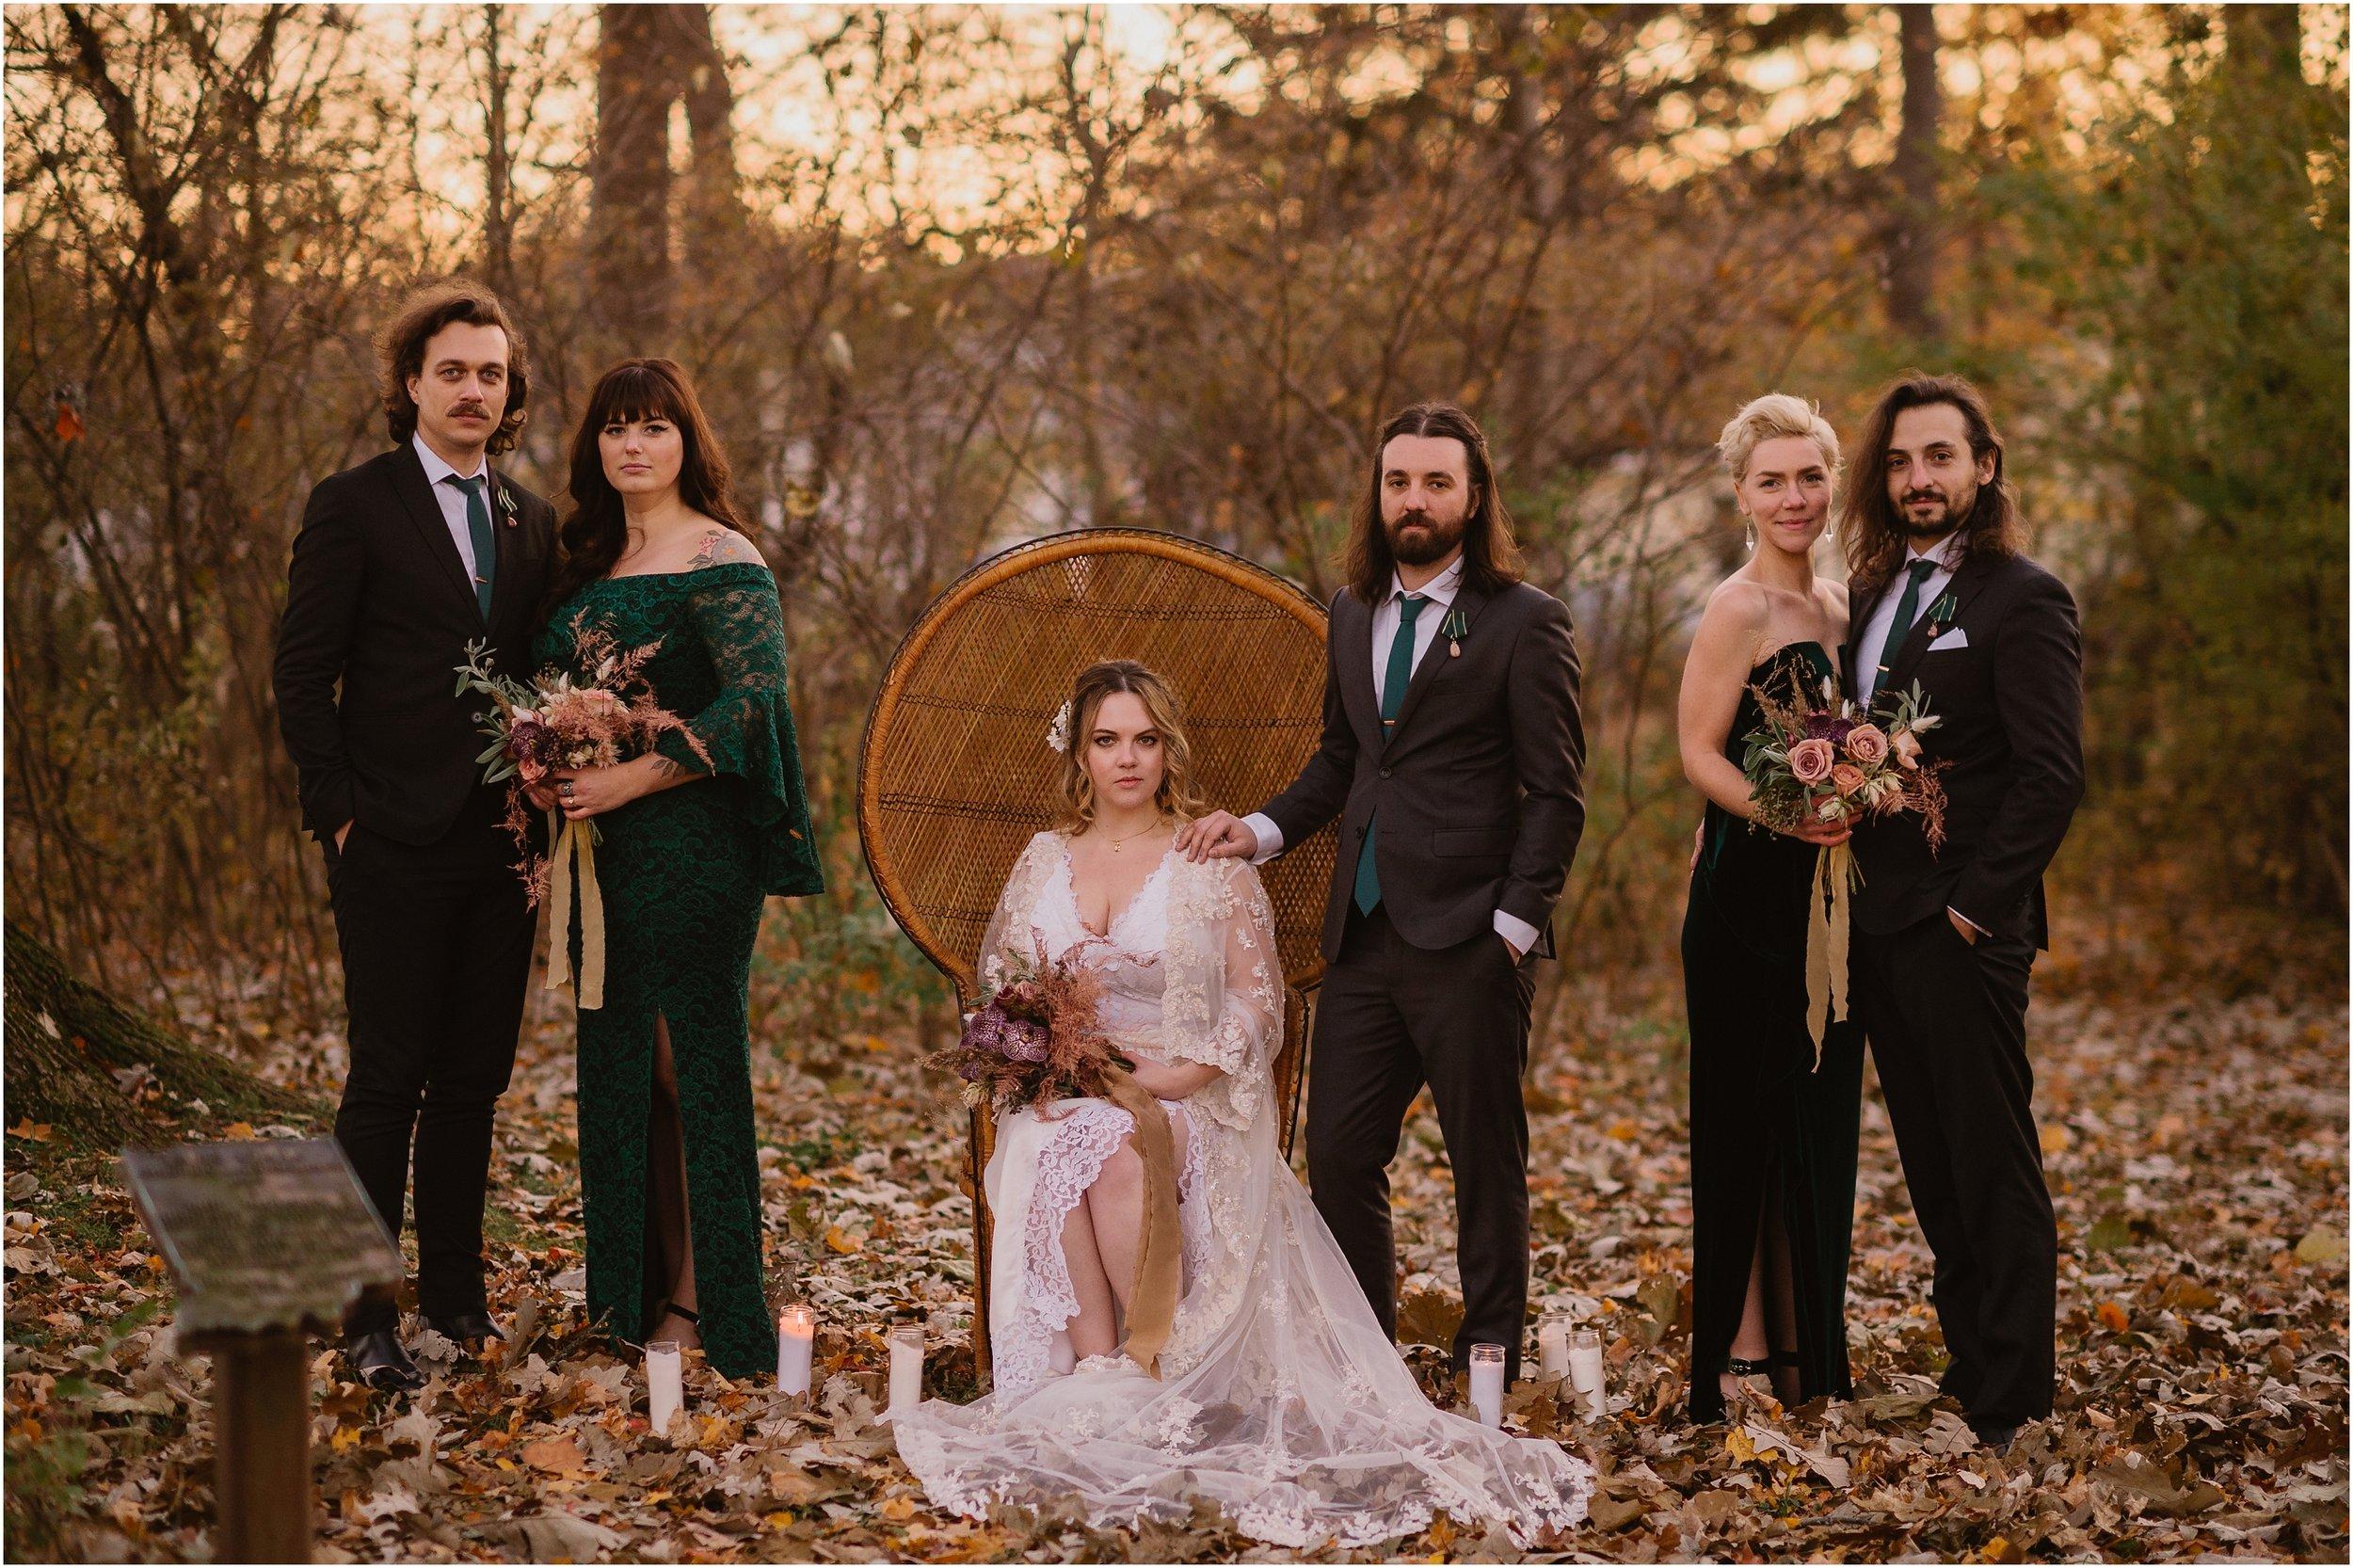 Rebecca_Shehorn_Photography_Indianapolis_Wedding_Photographer_9446.jpg